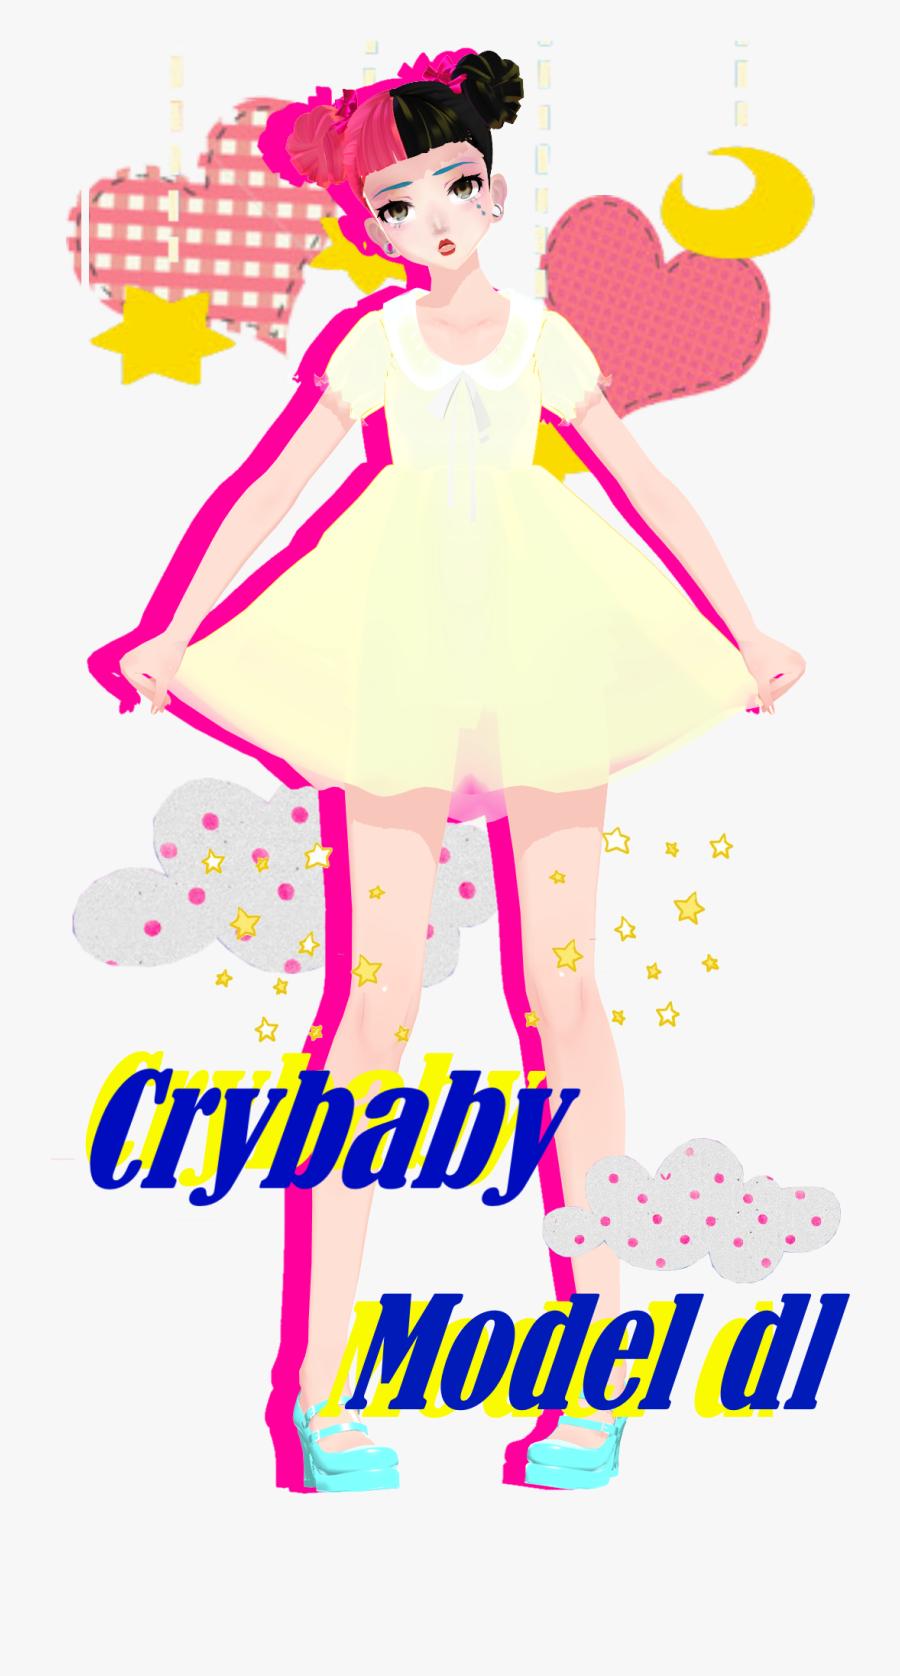 [mmd] Tda Melanie Martinez-crybaby By Reggieandcheese - Melanie Martinez Cry Baby Mmd Dl, Transparent Clipart